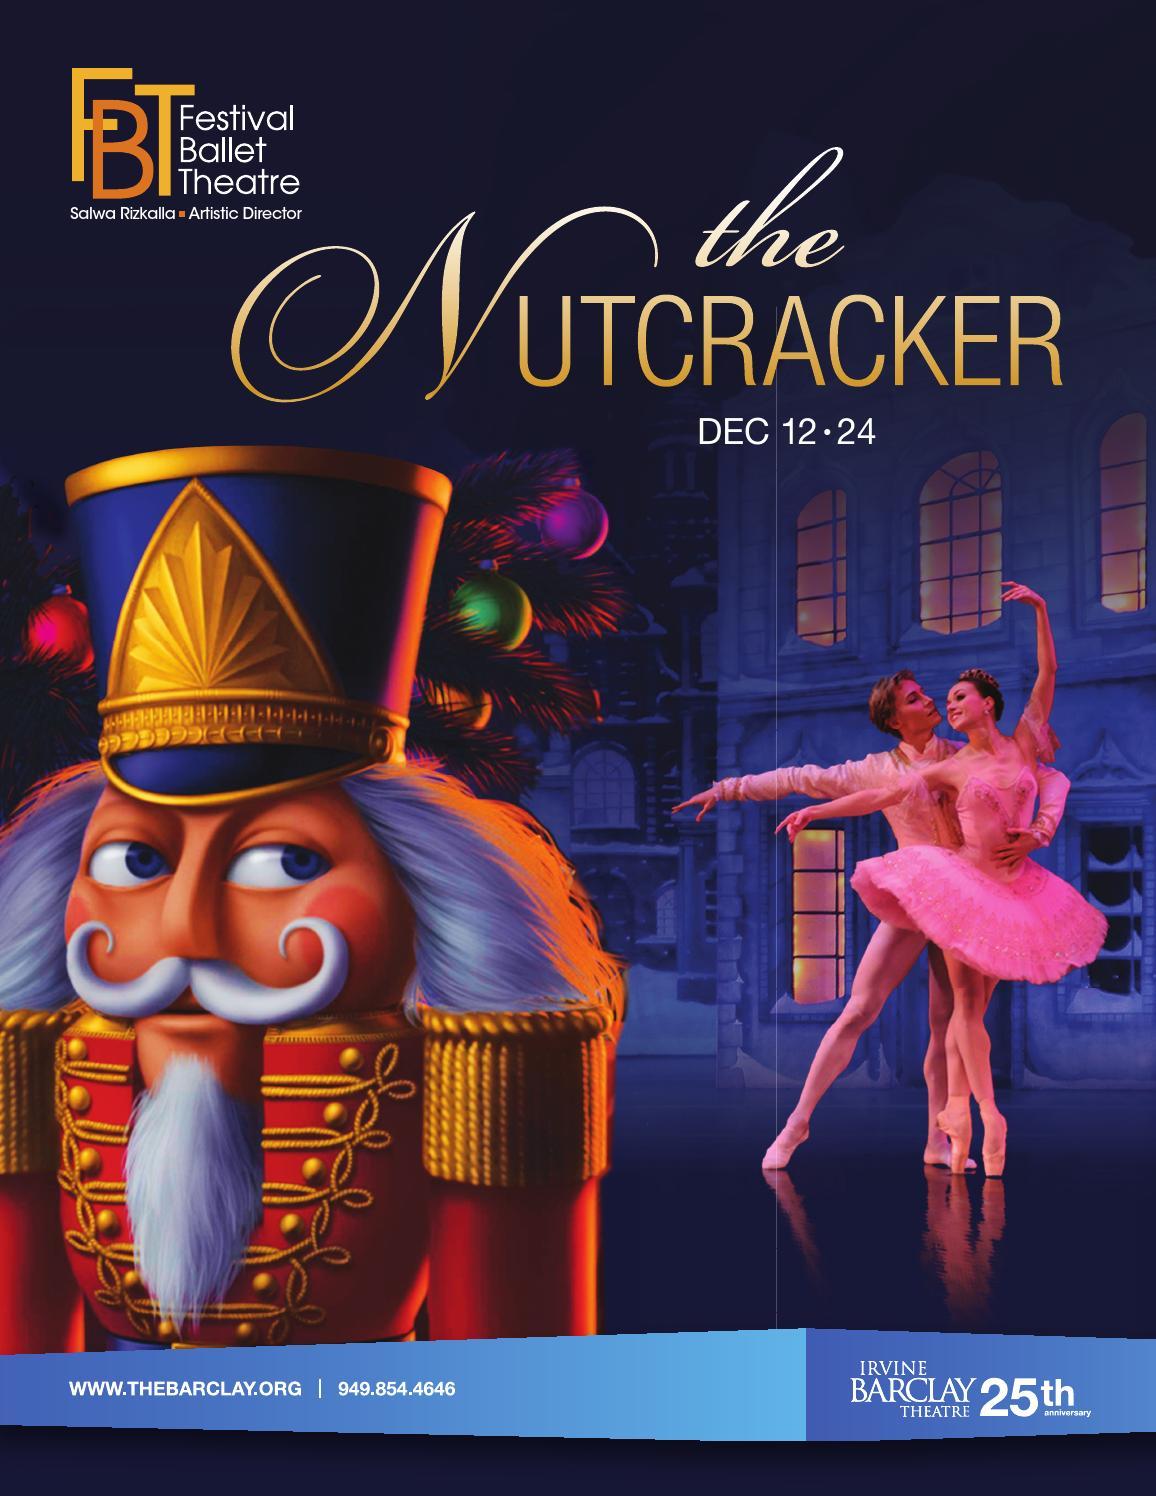 Festival Ballet Theatre's The Nutcracker Program Notes by